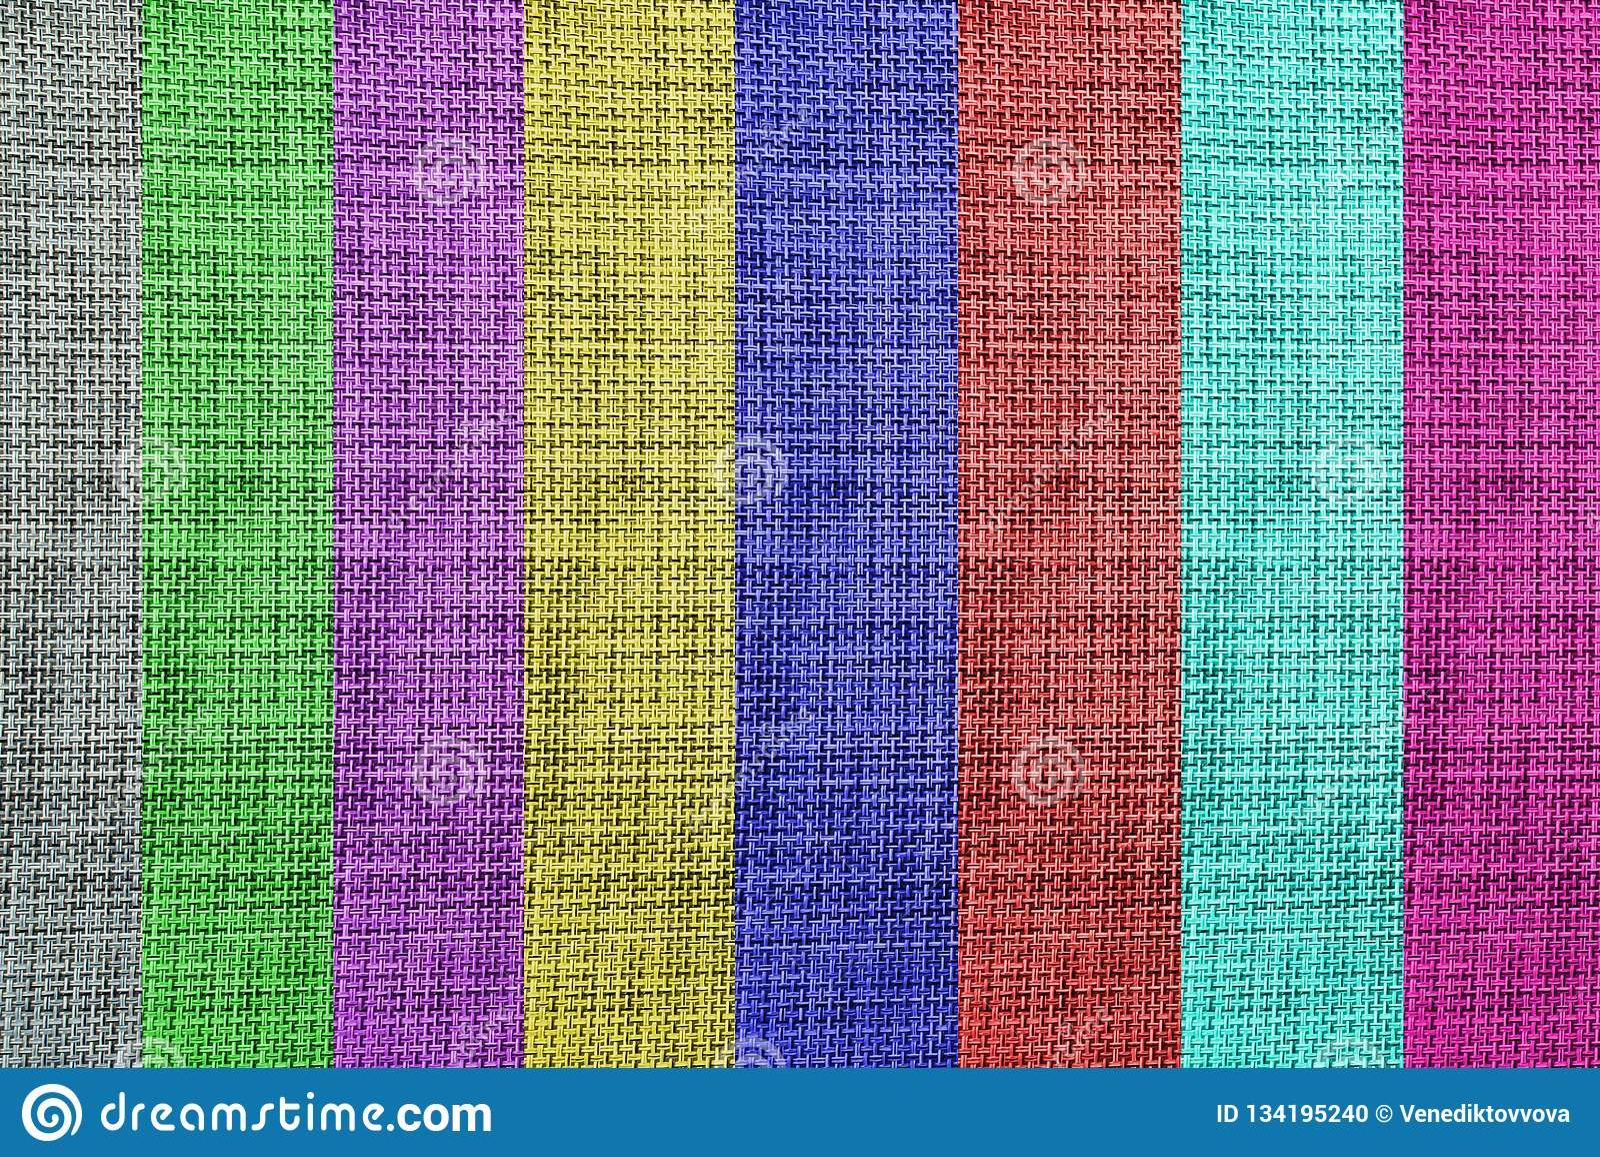 Art texturisé coloré de fond de tissu